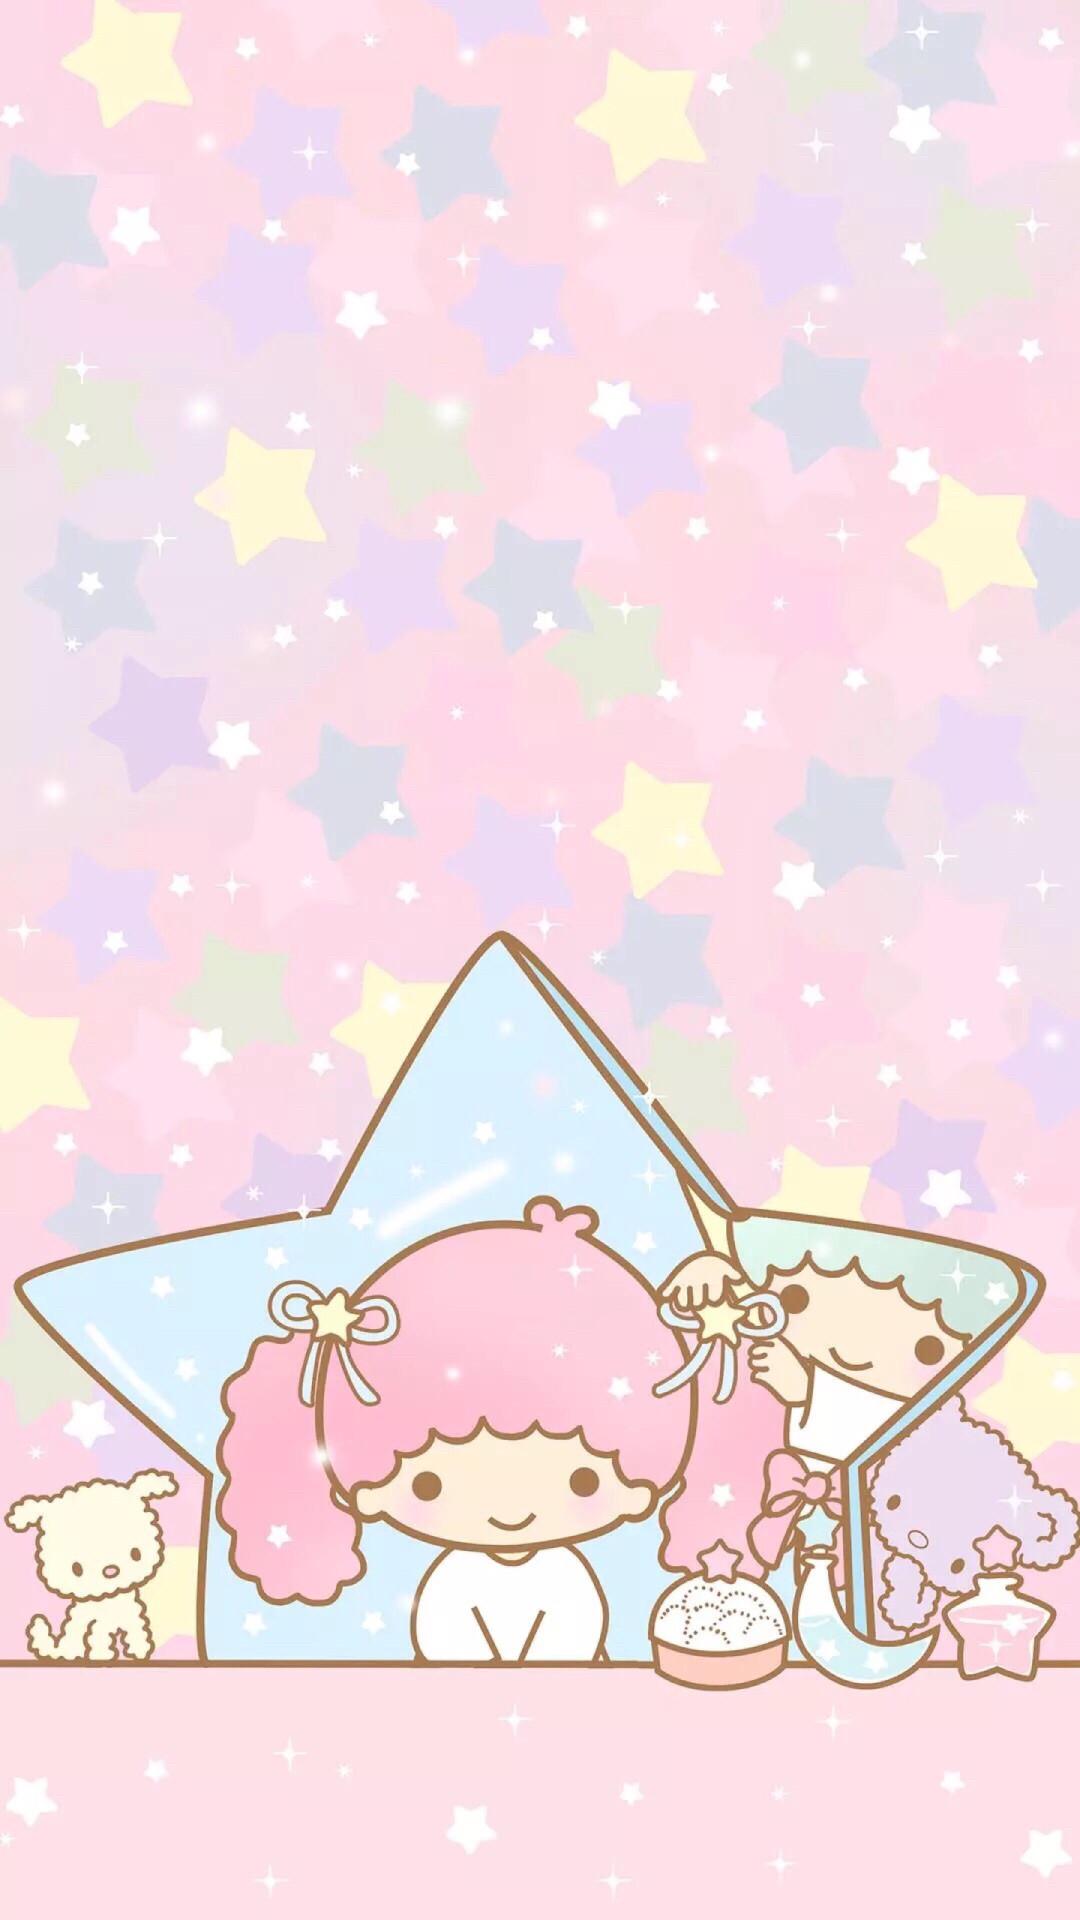 Sanrio Pom Pom Purin And Macaron Wallpaper